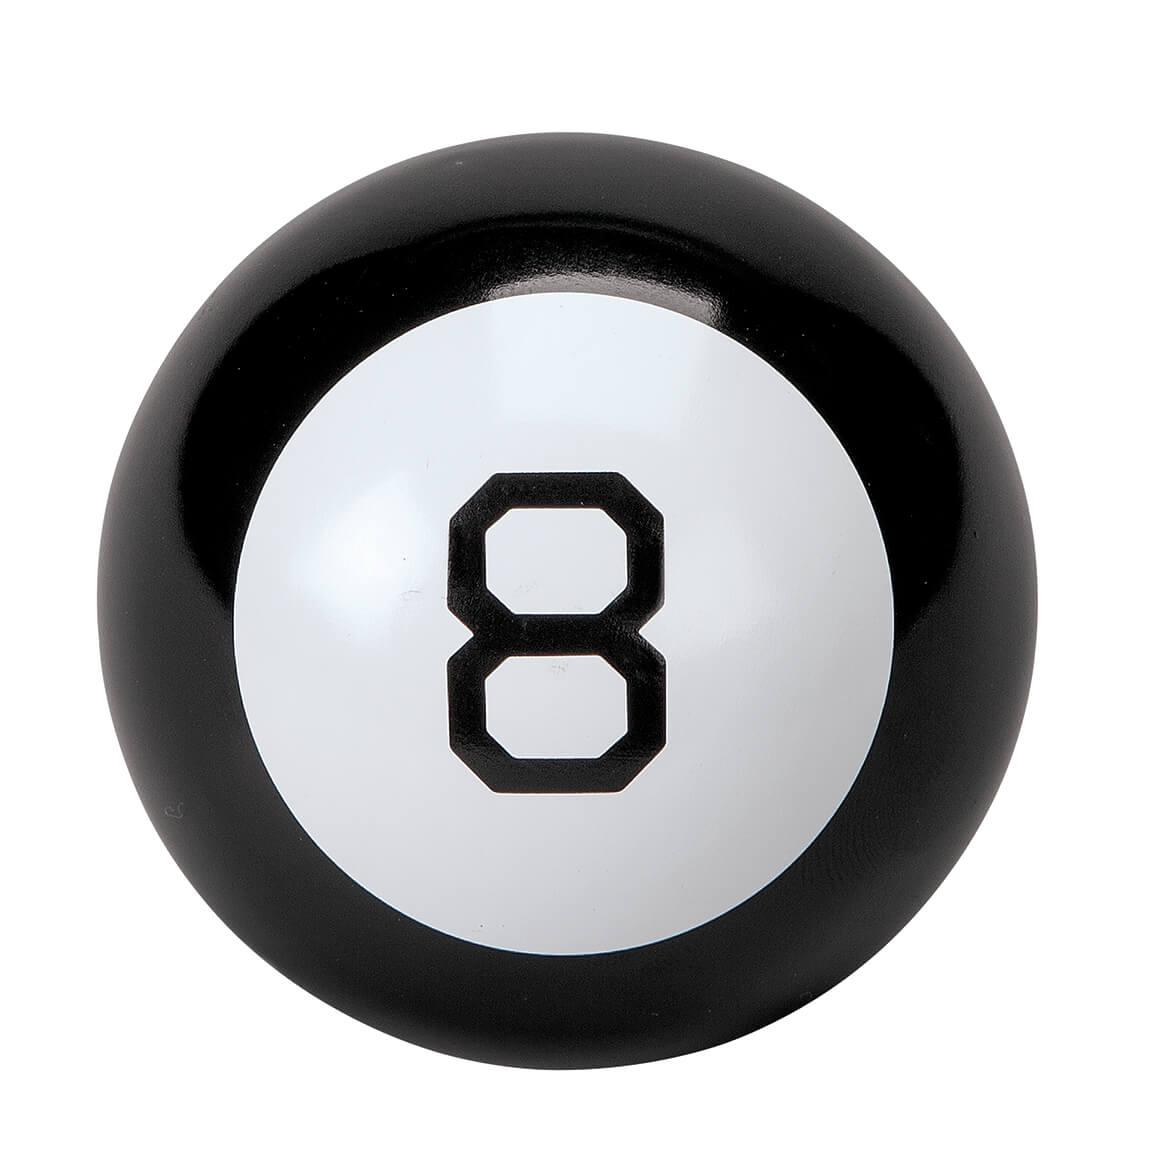 Magic 8 Ball Candy, 1.5oz.-368784